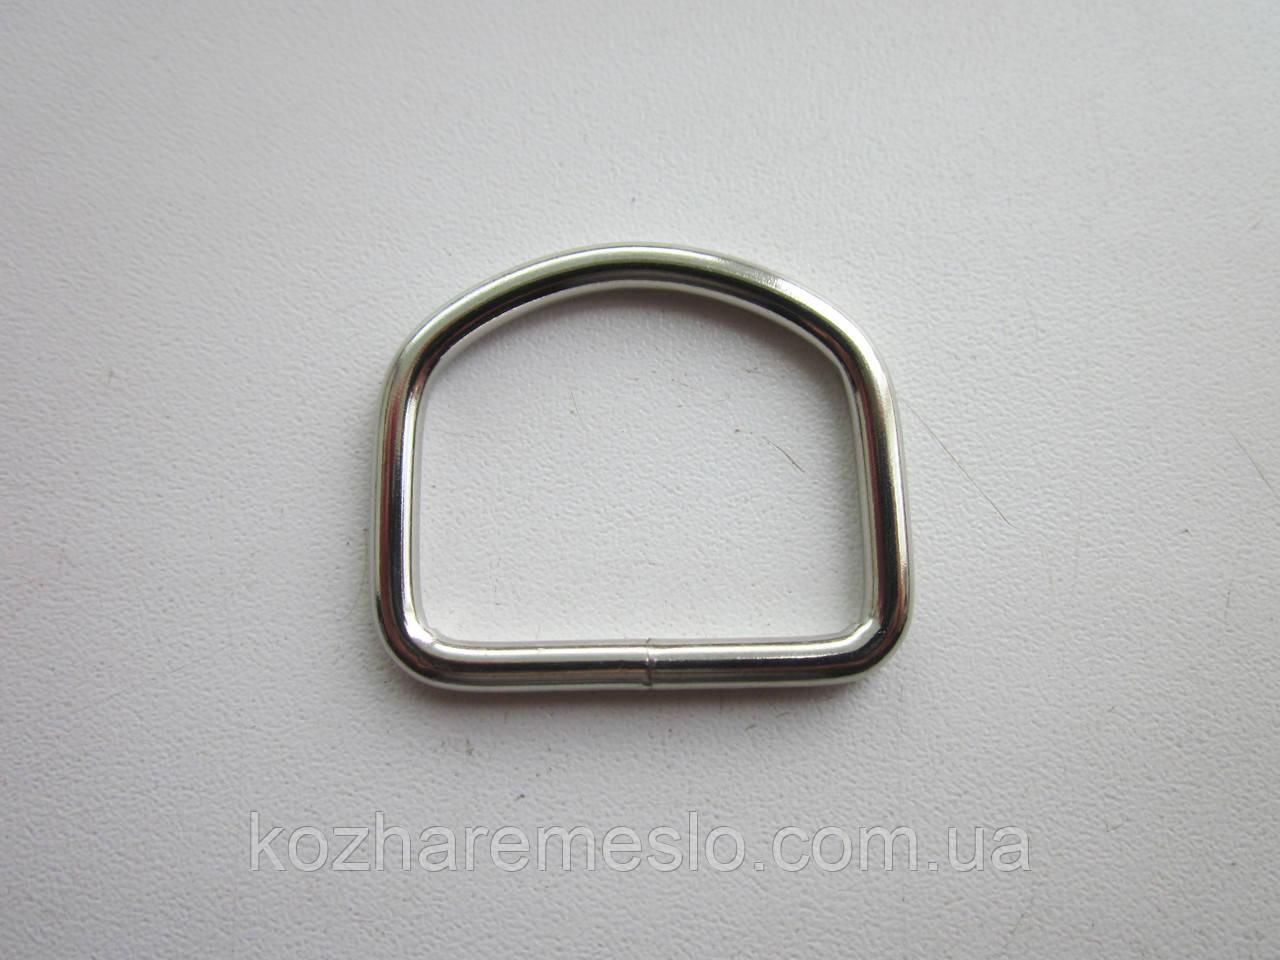 Полукольцо 4,5 х 35  х 25 мм никель